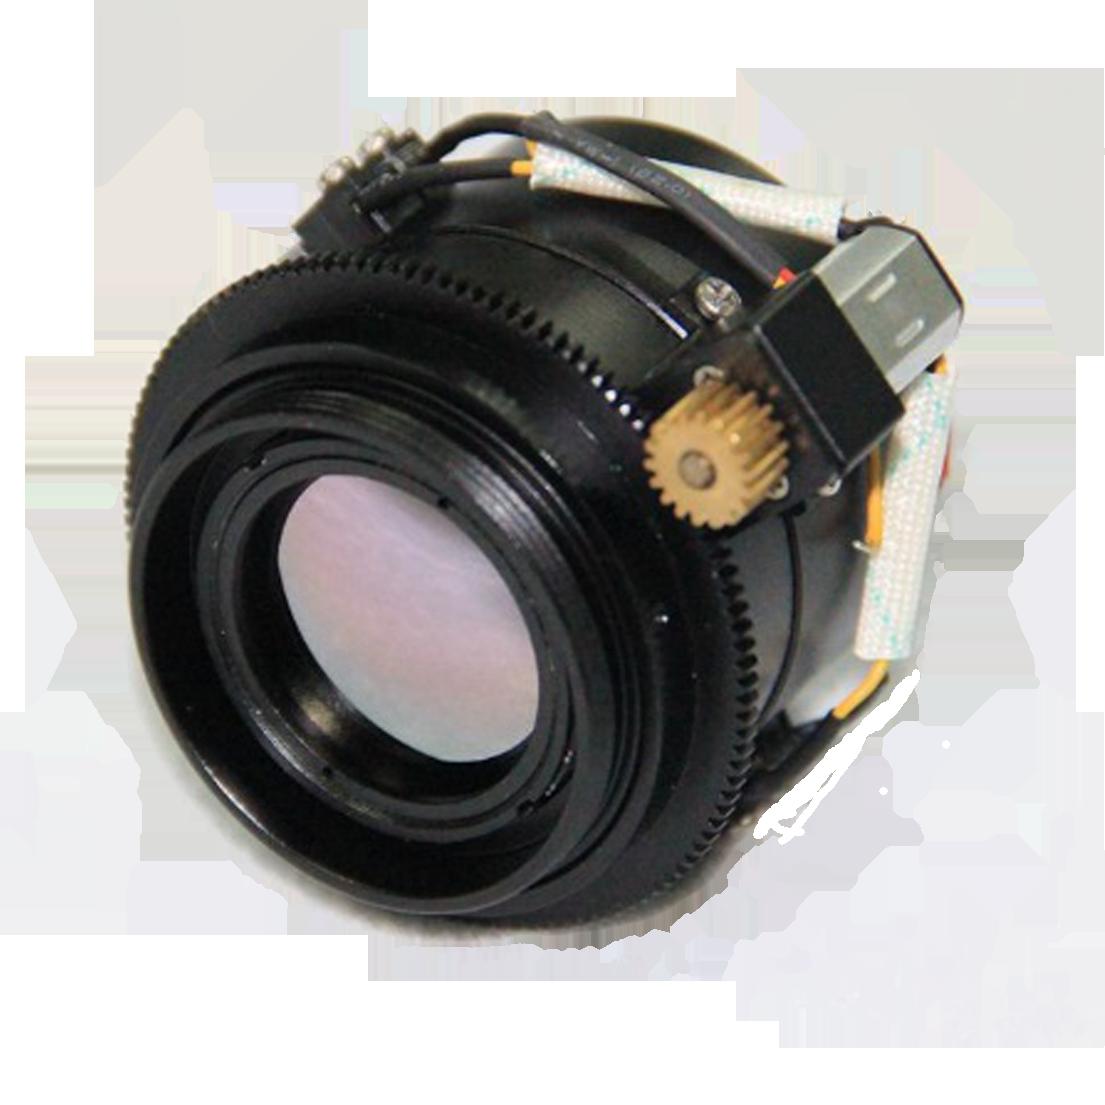 35mm热成像镜头HRC-TL35